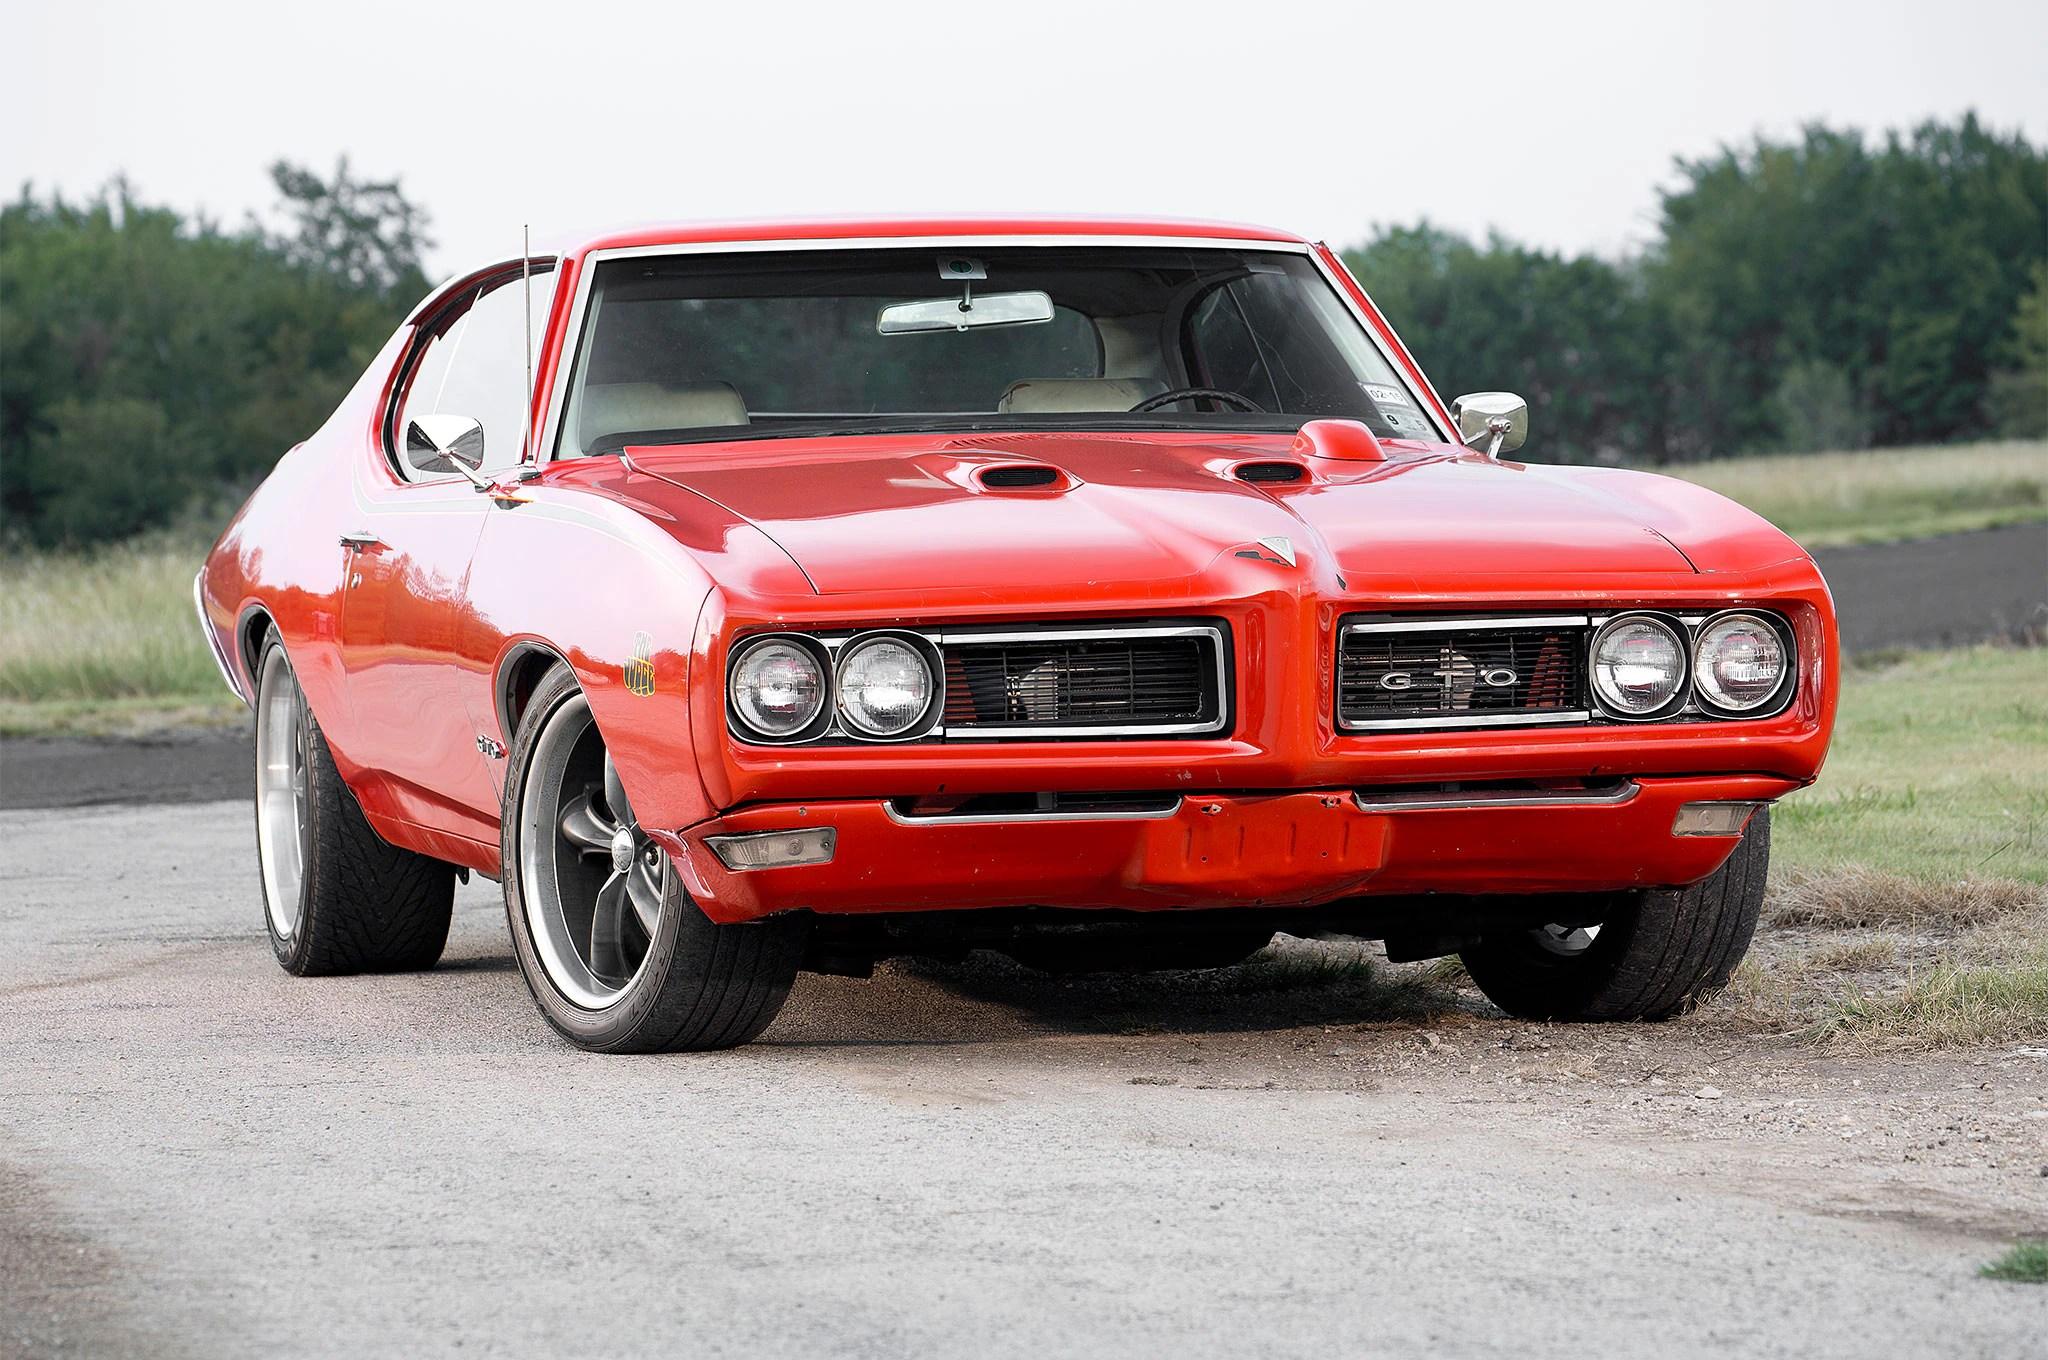 Classic Mustang Car Wallpaper 1969 Pontiac Gto Too Legit To Quit Hot Rod Network